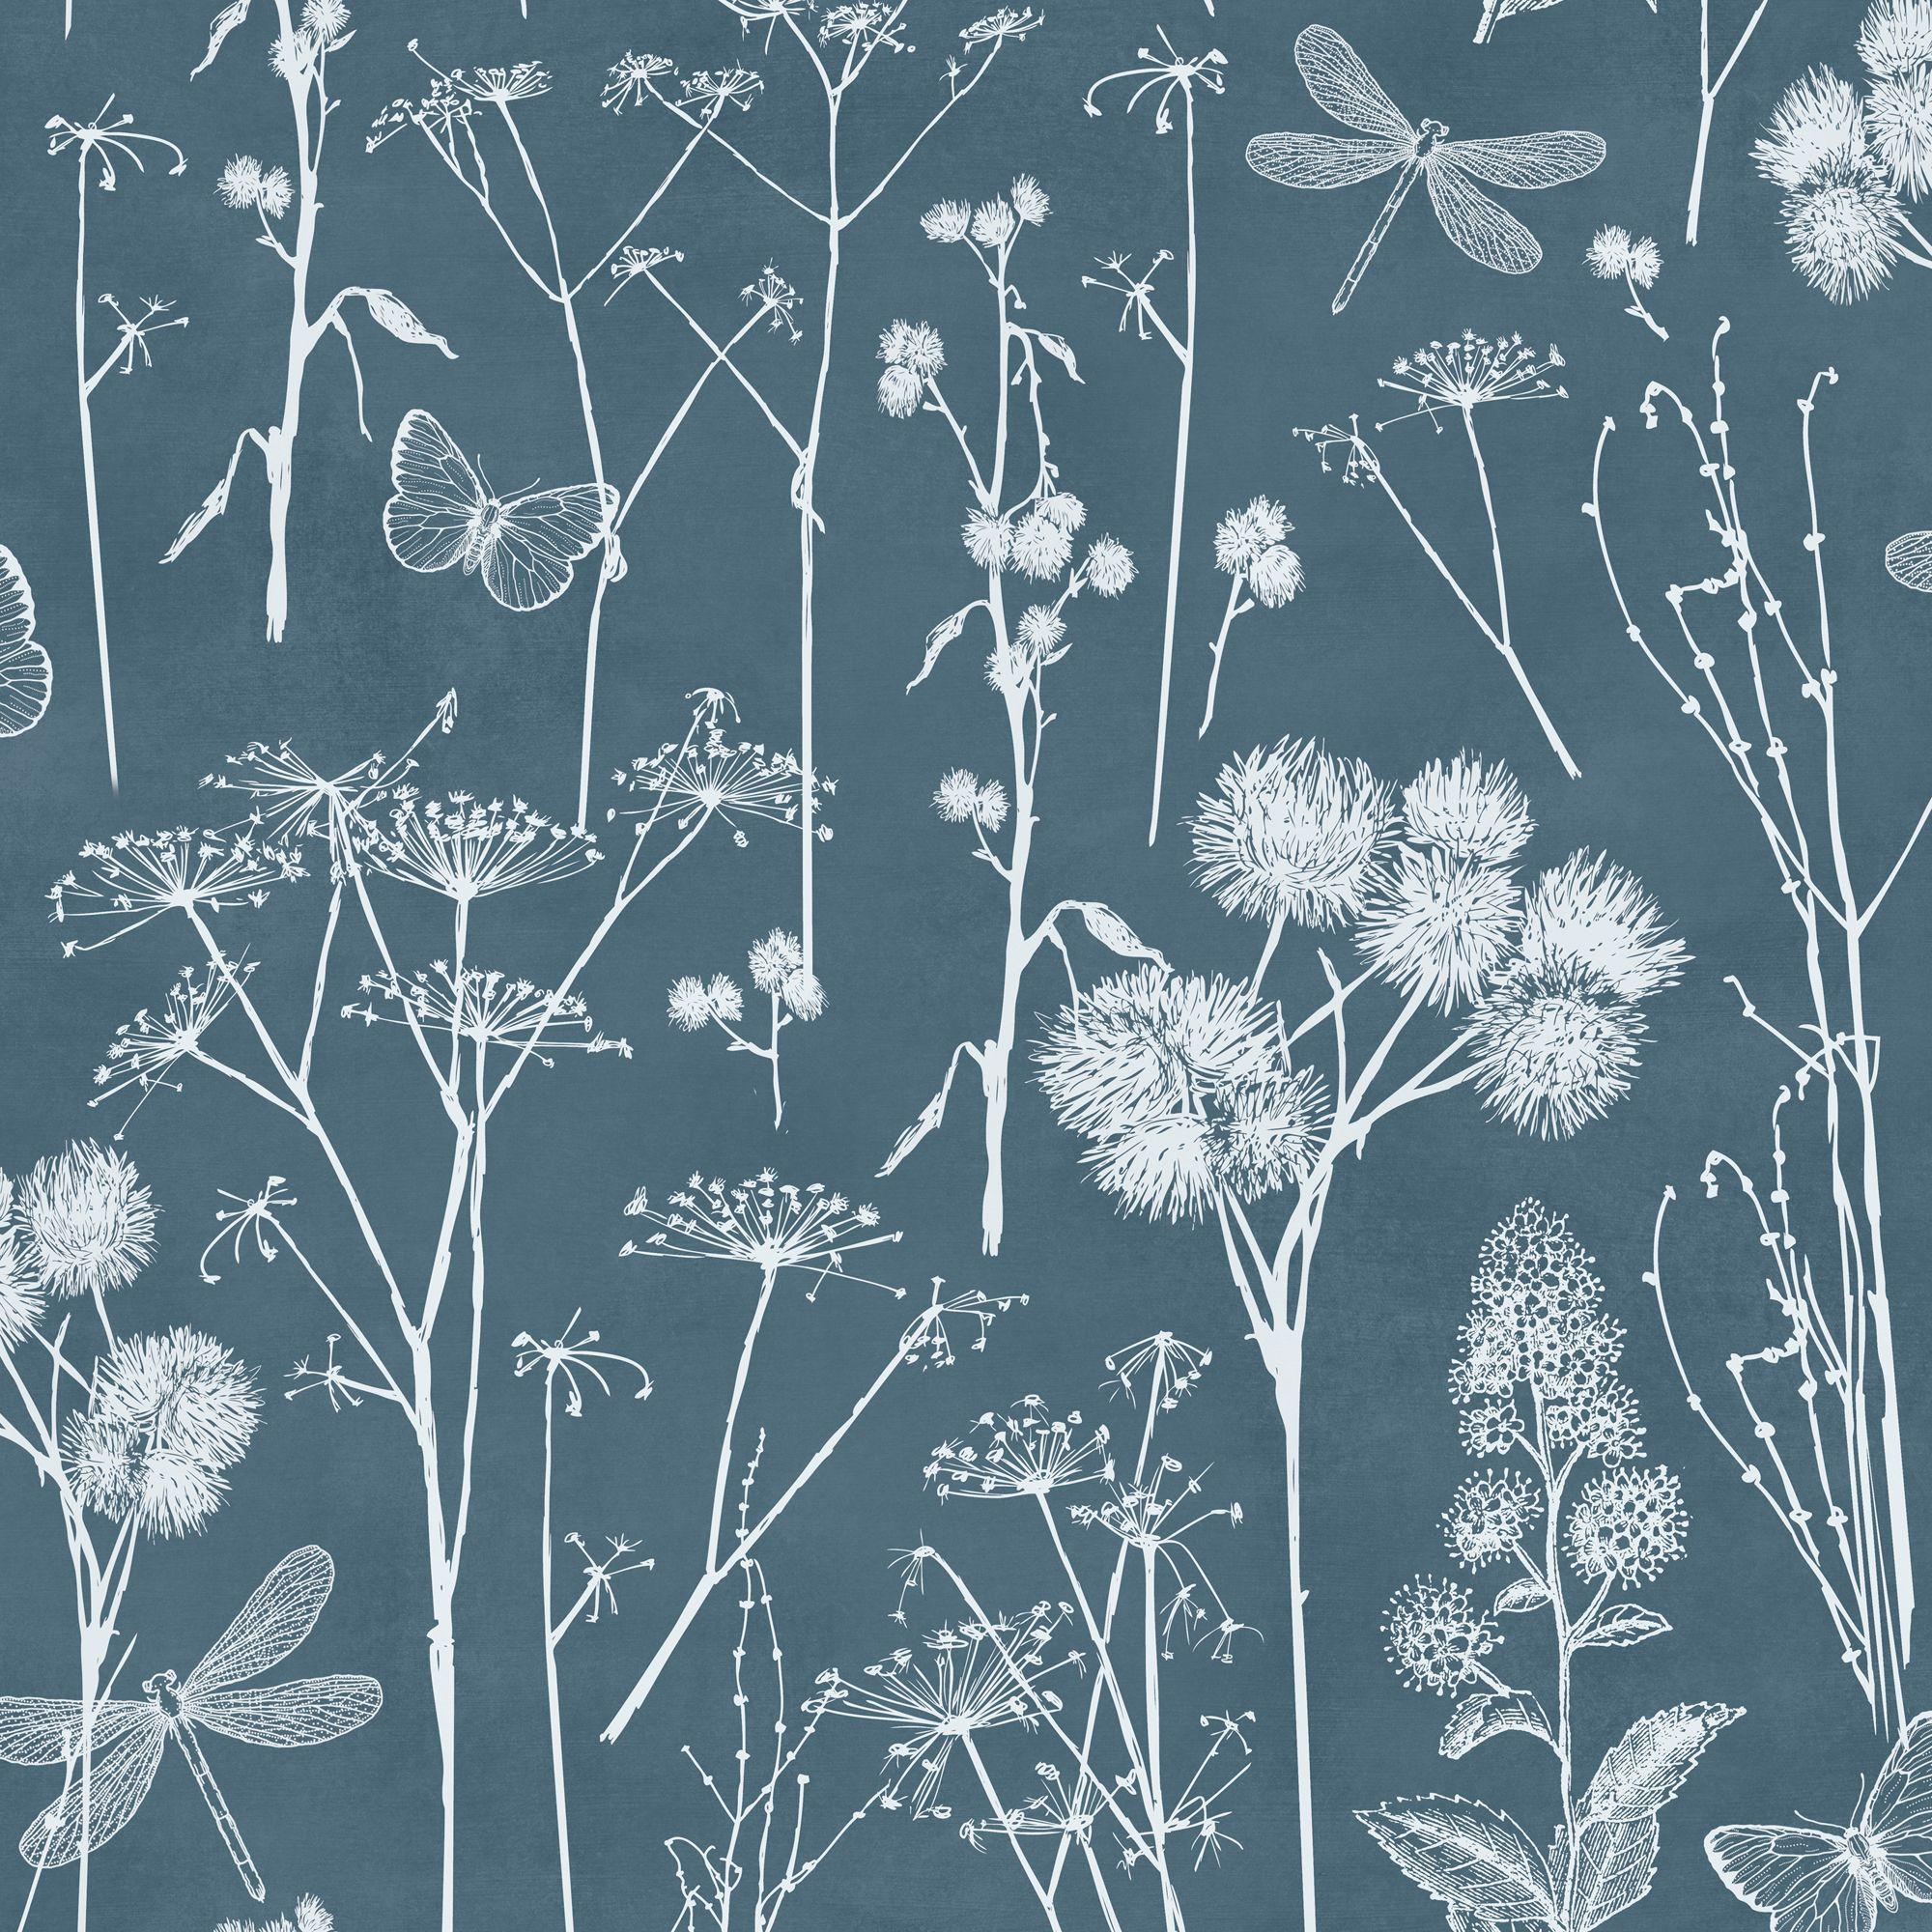 Botanical Blackboard Teal Foliage Wallpaper Departments